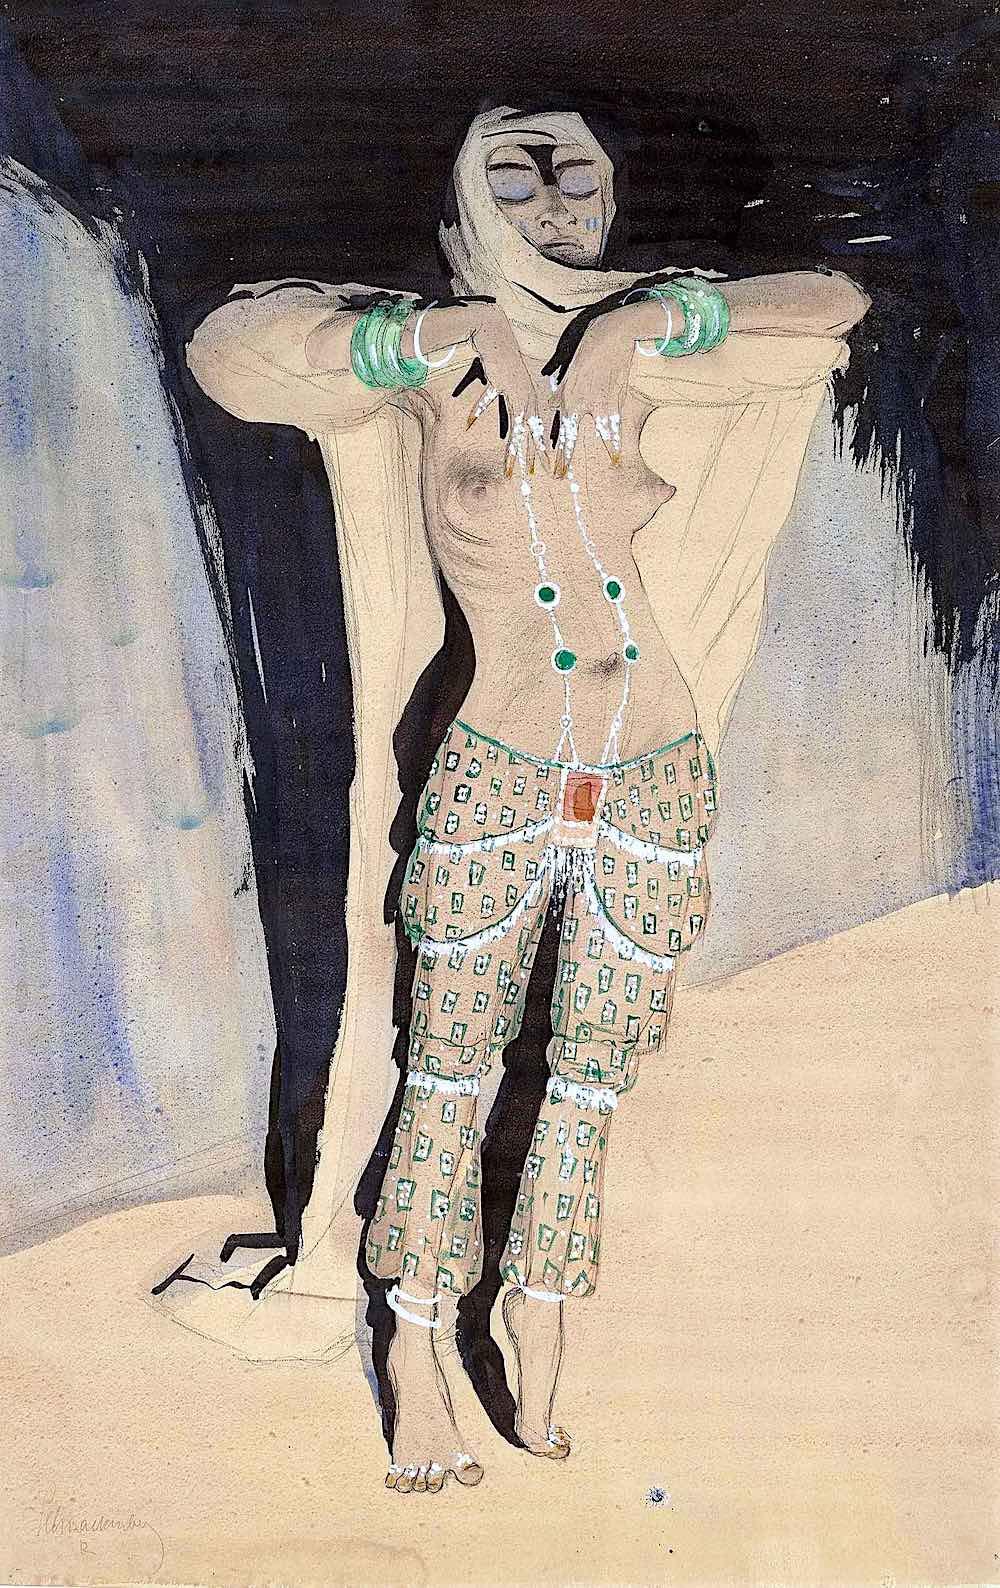 Walter Schnackenberg, a woman dancer